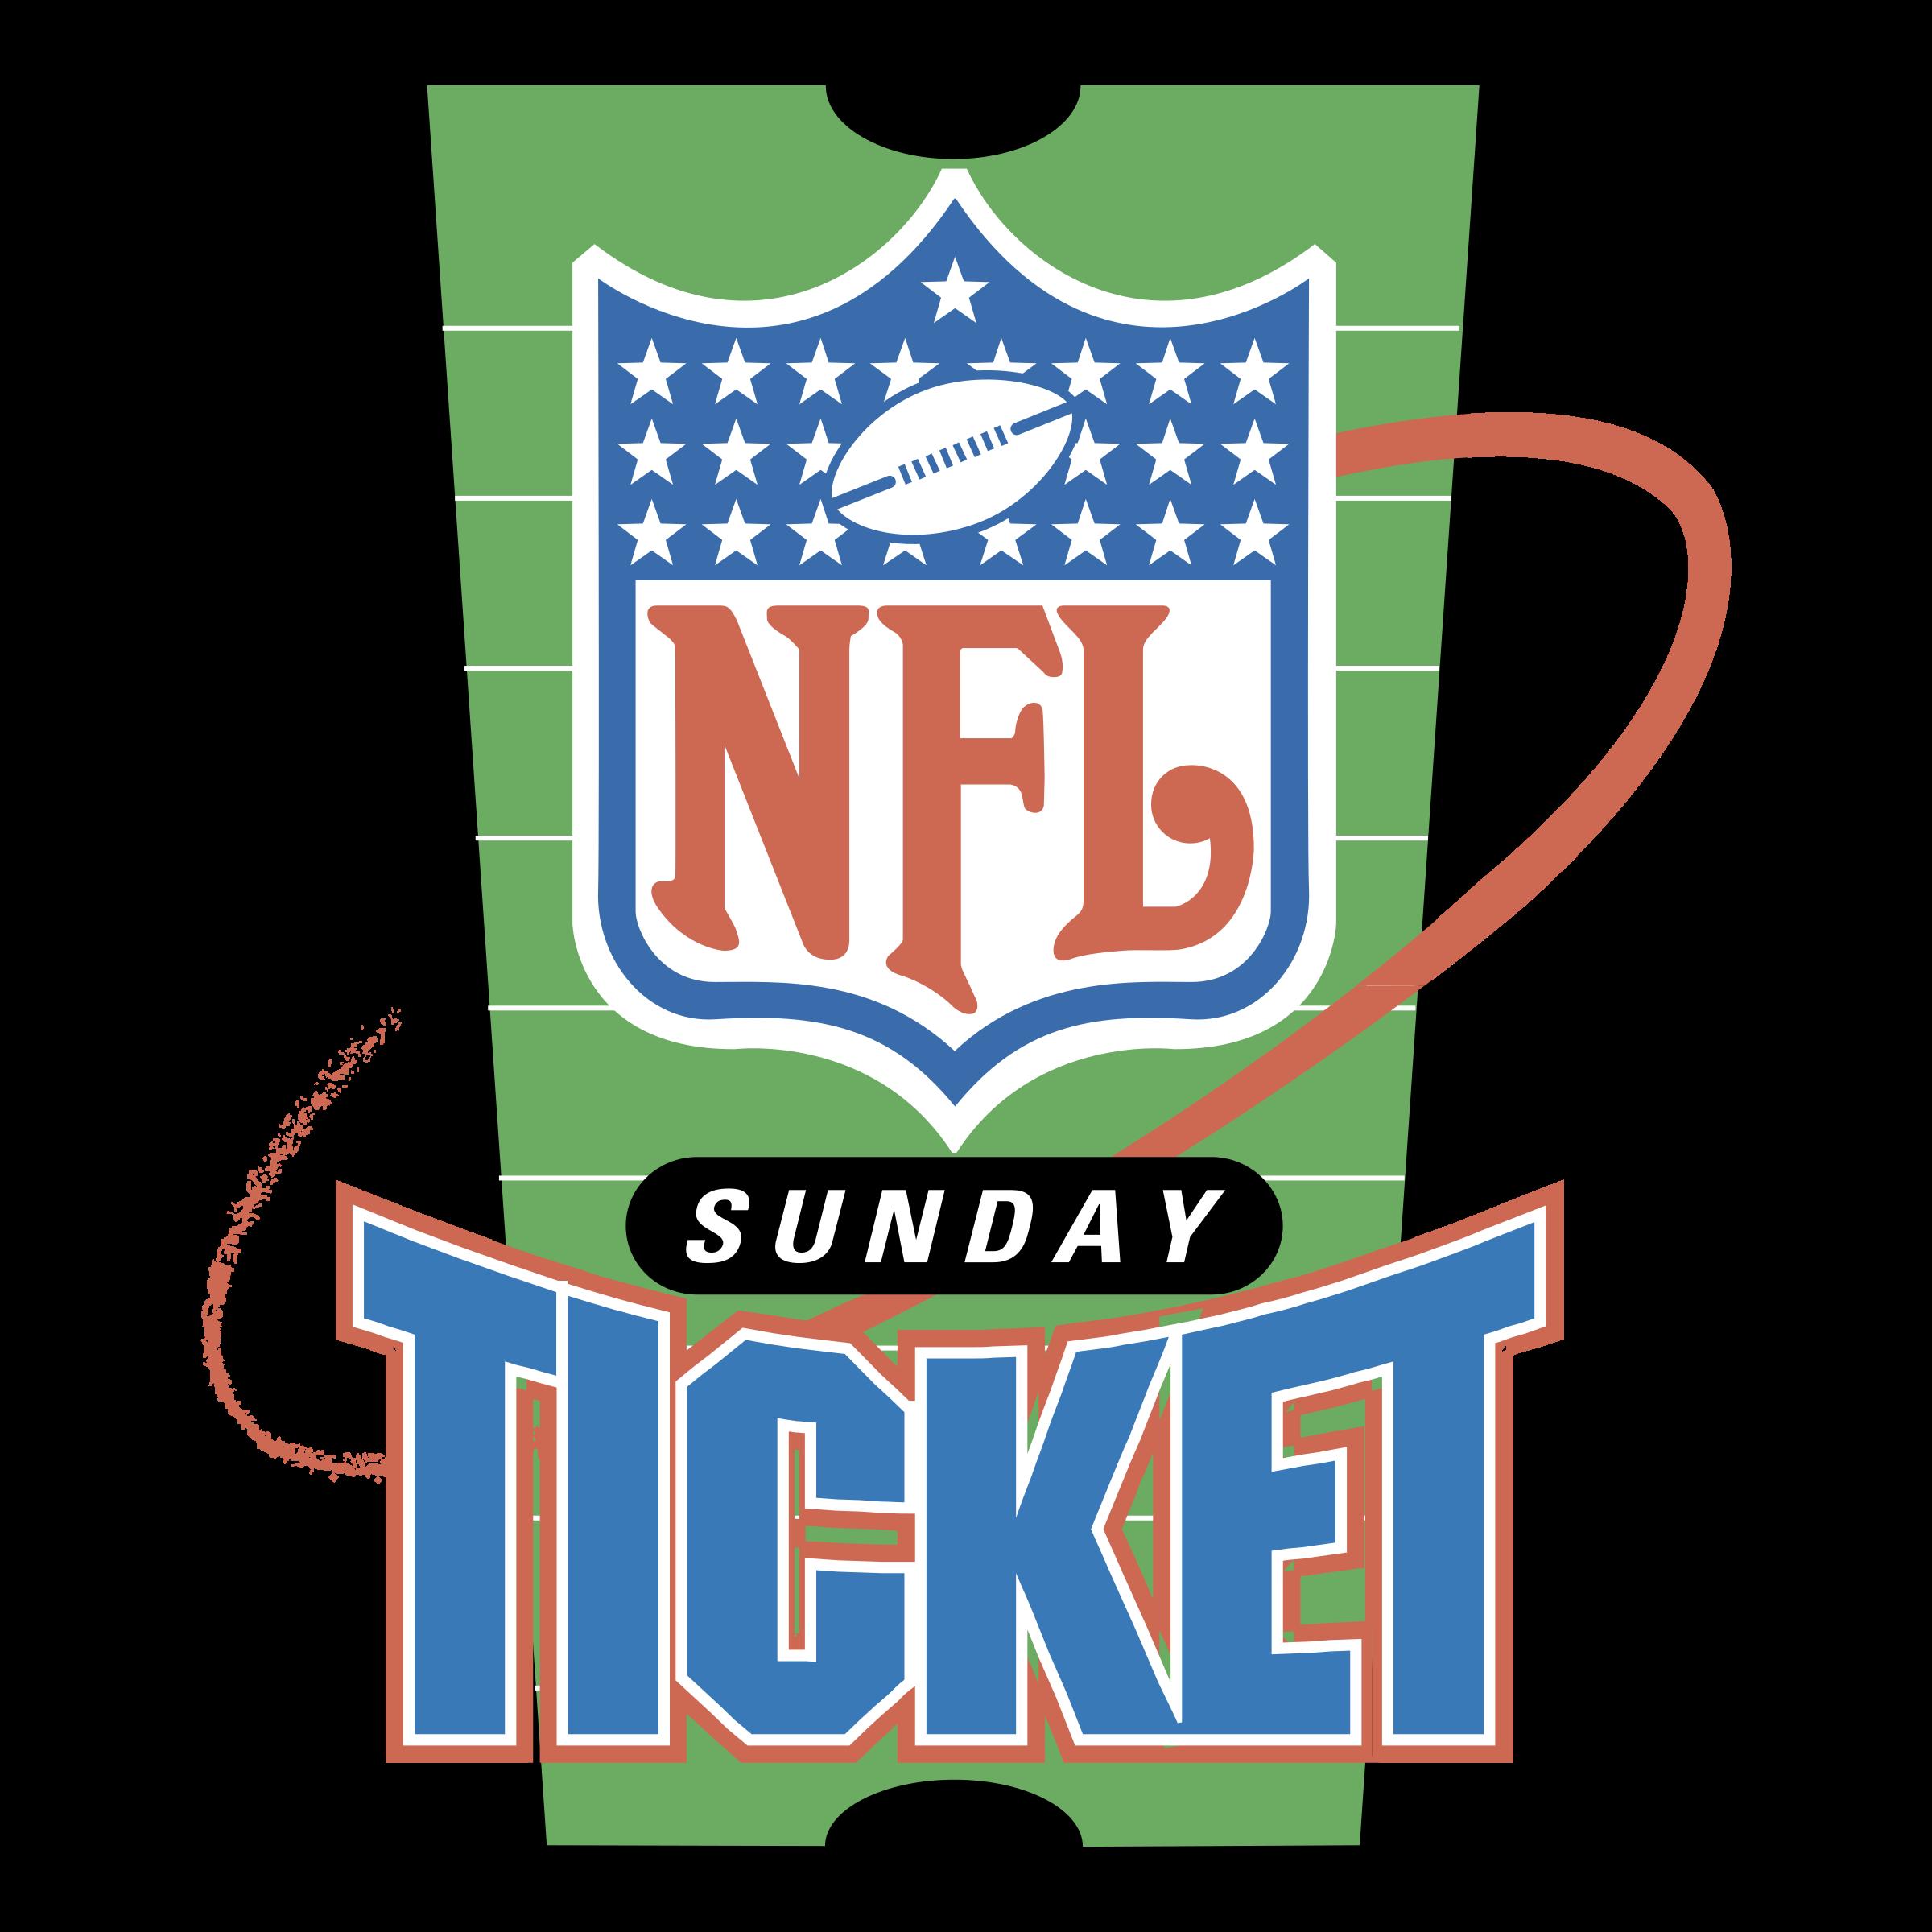 nfl sunday ticket logo png transparent svg vector freebie supply rh freebiesupply com nfl logo vector files nfl vector logos free